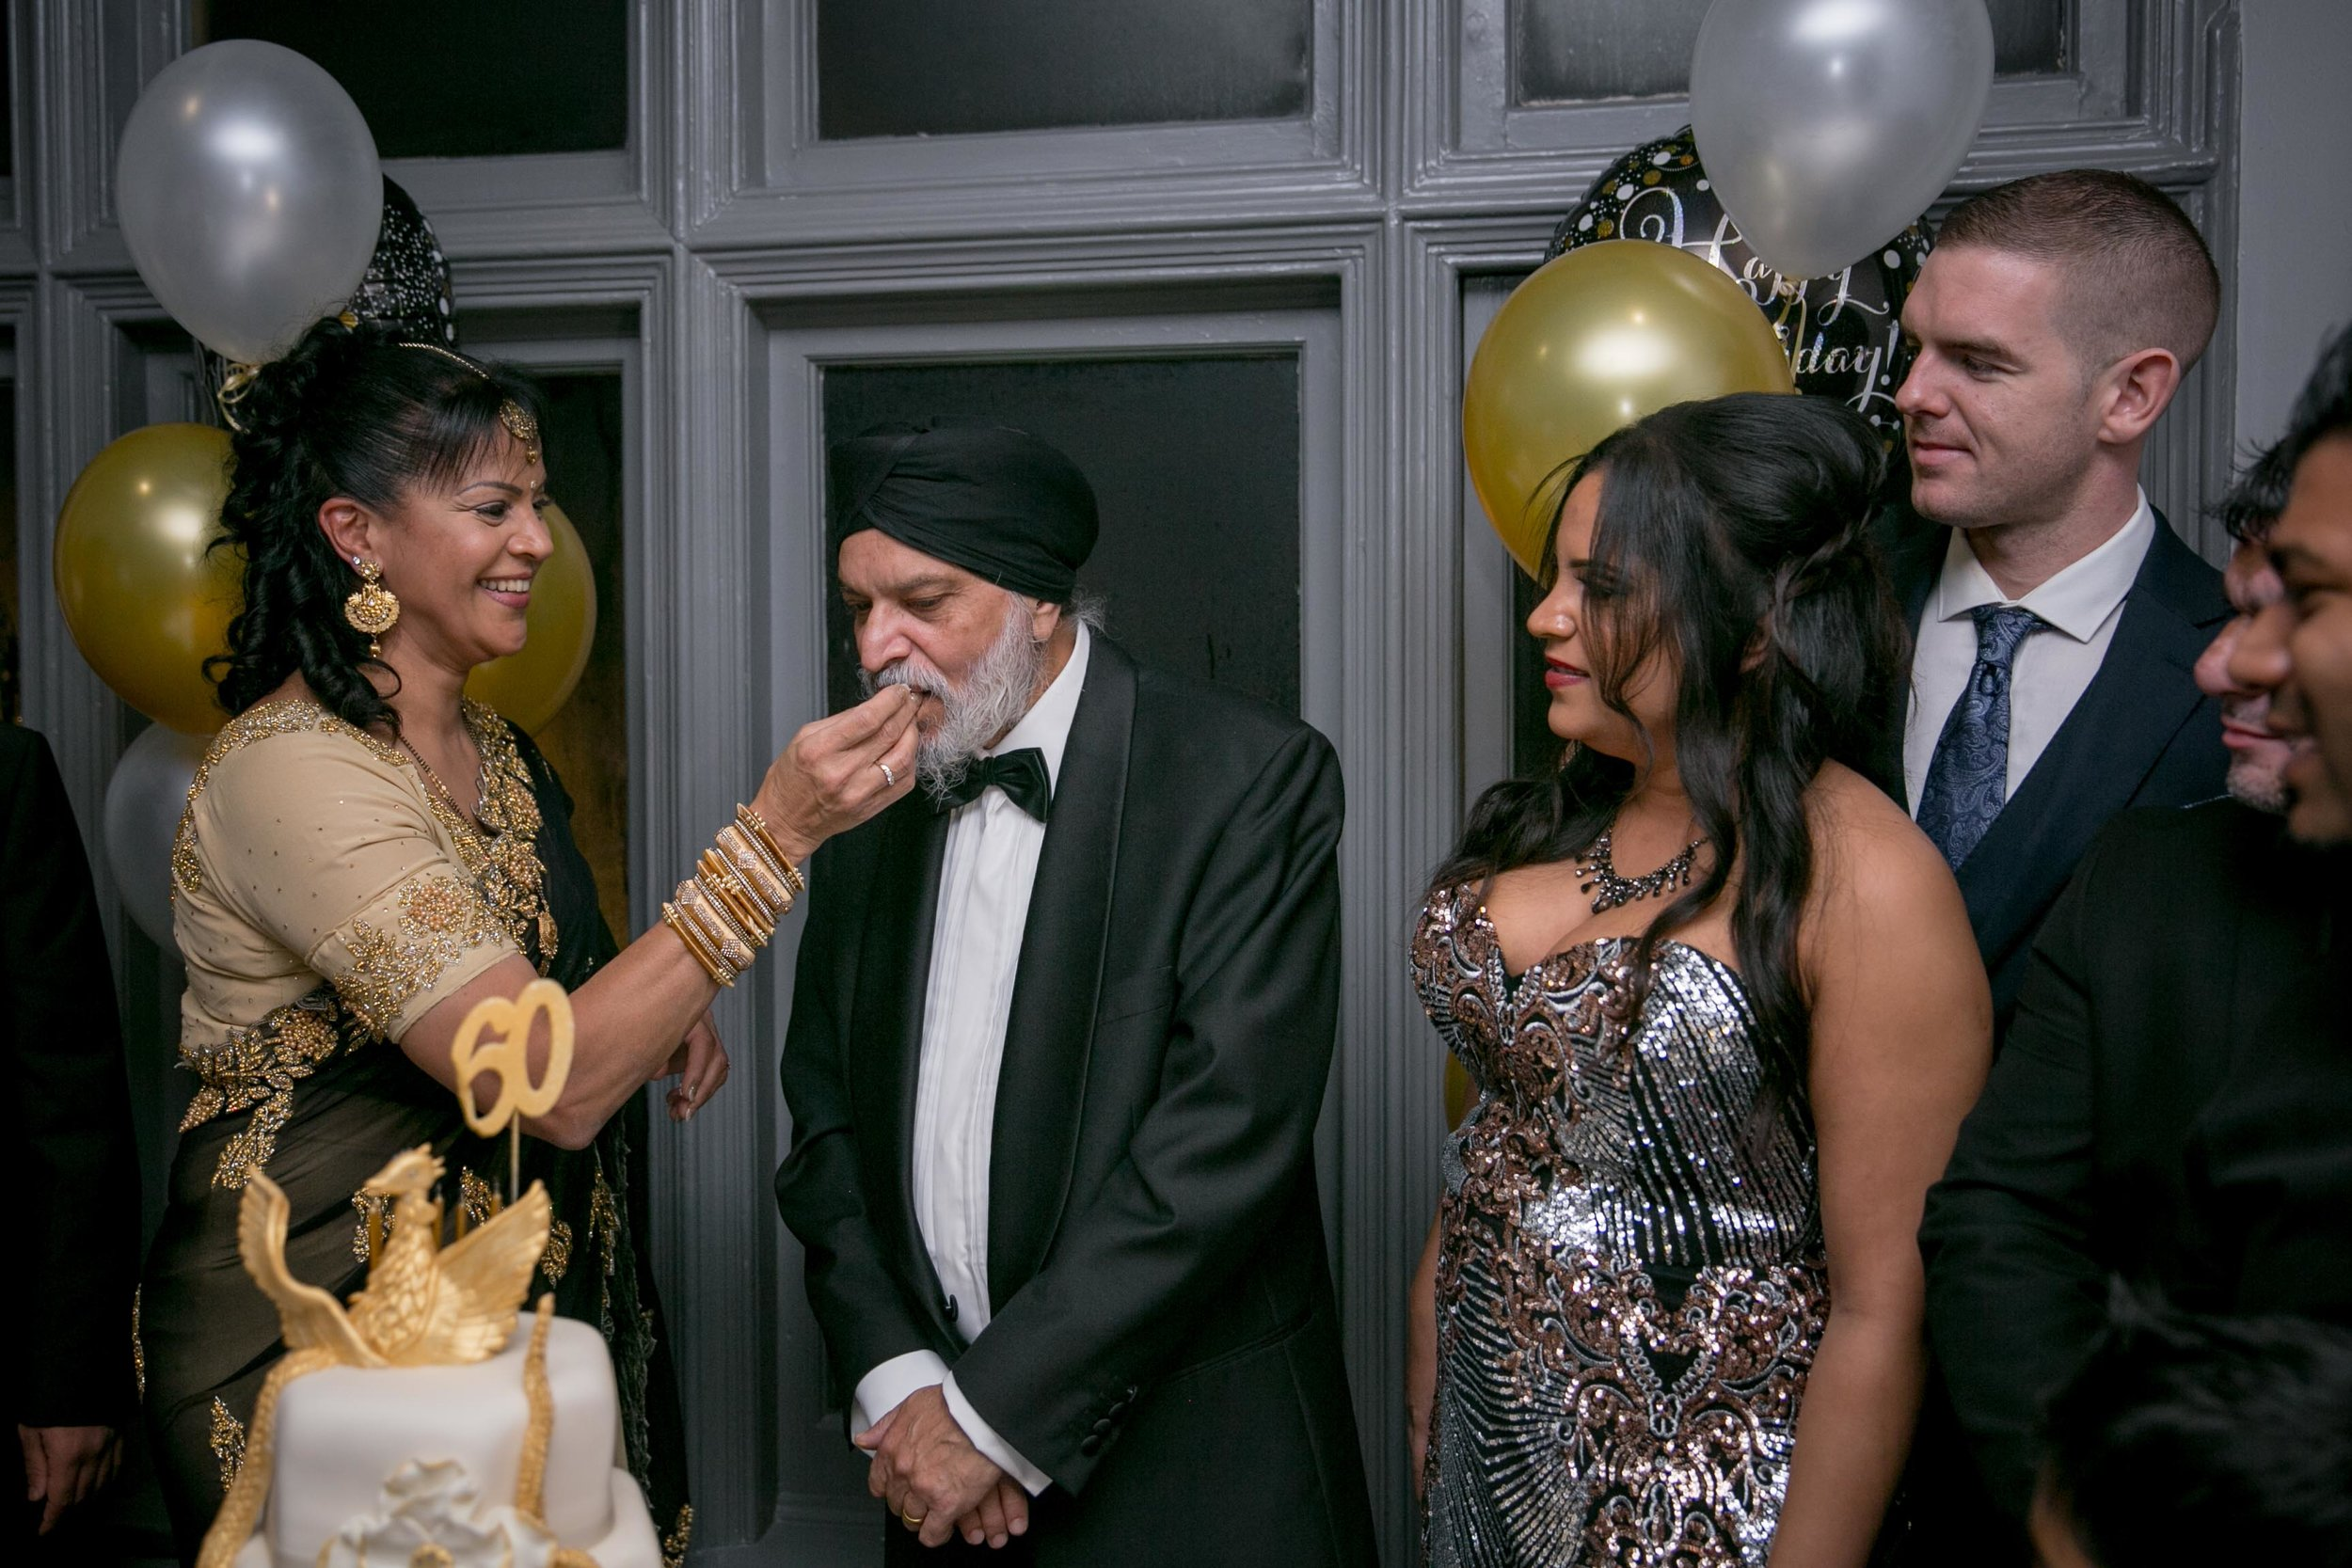 hilton-double-tree-cadbury-house-surprise-birthday-party-photography-natalia-smith-photography-22.jpg